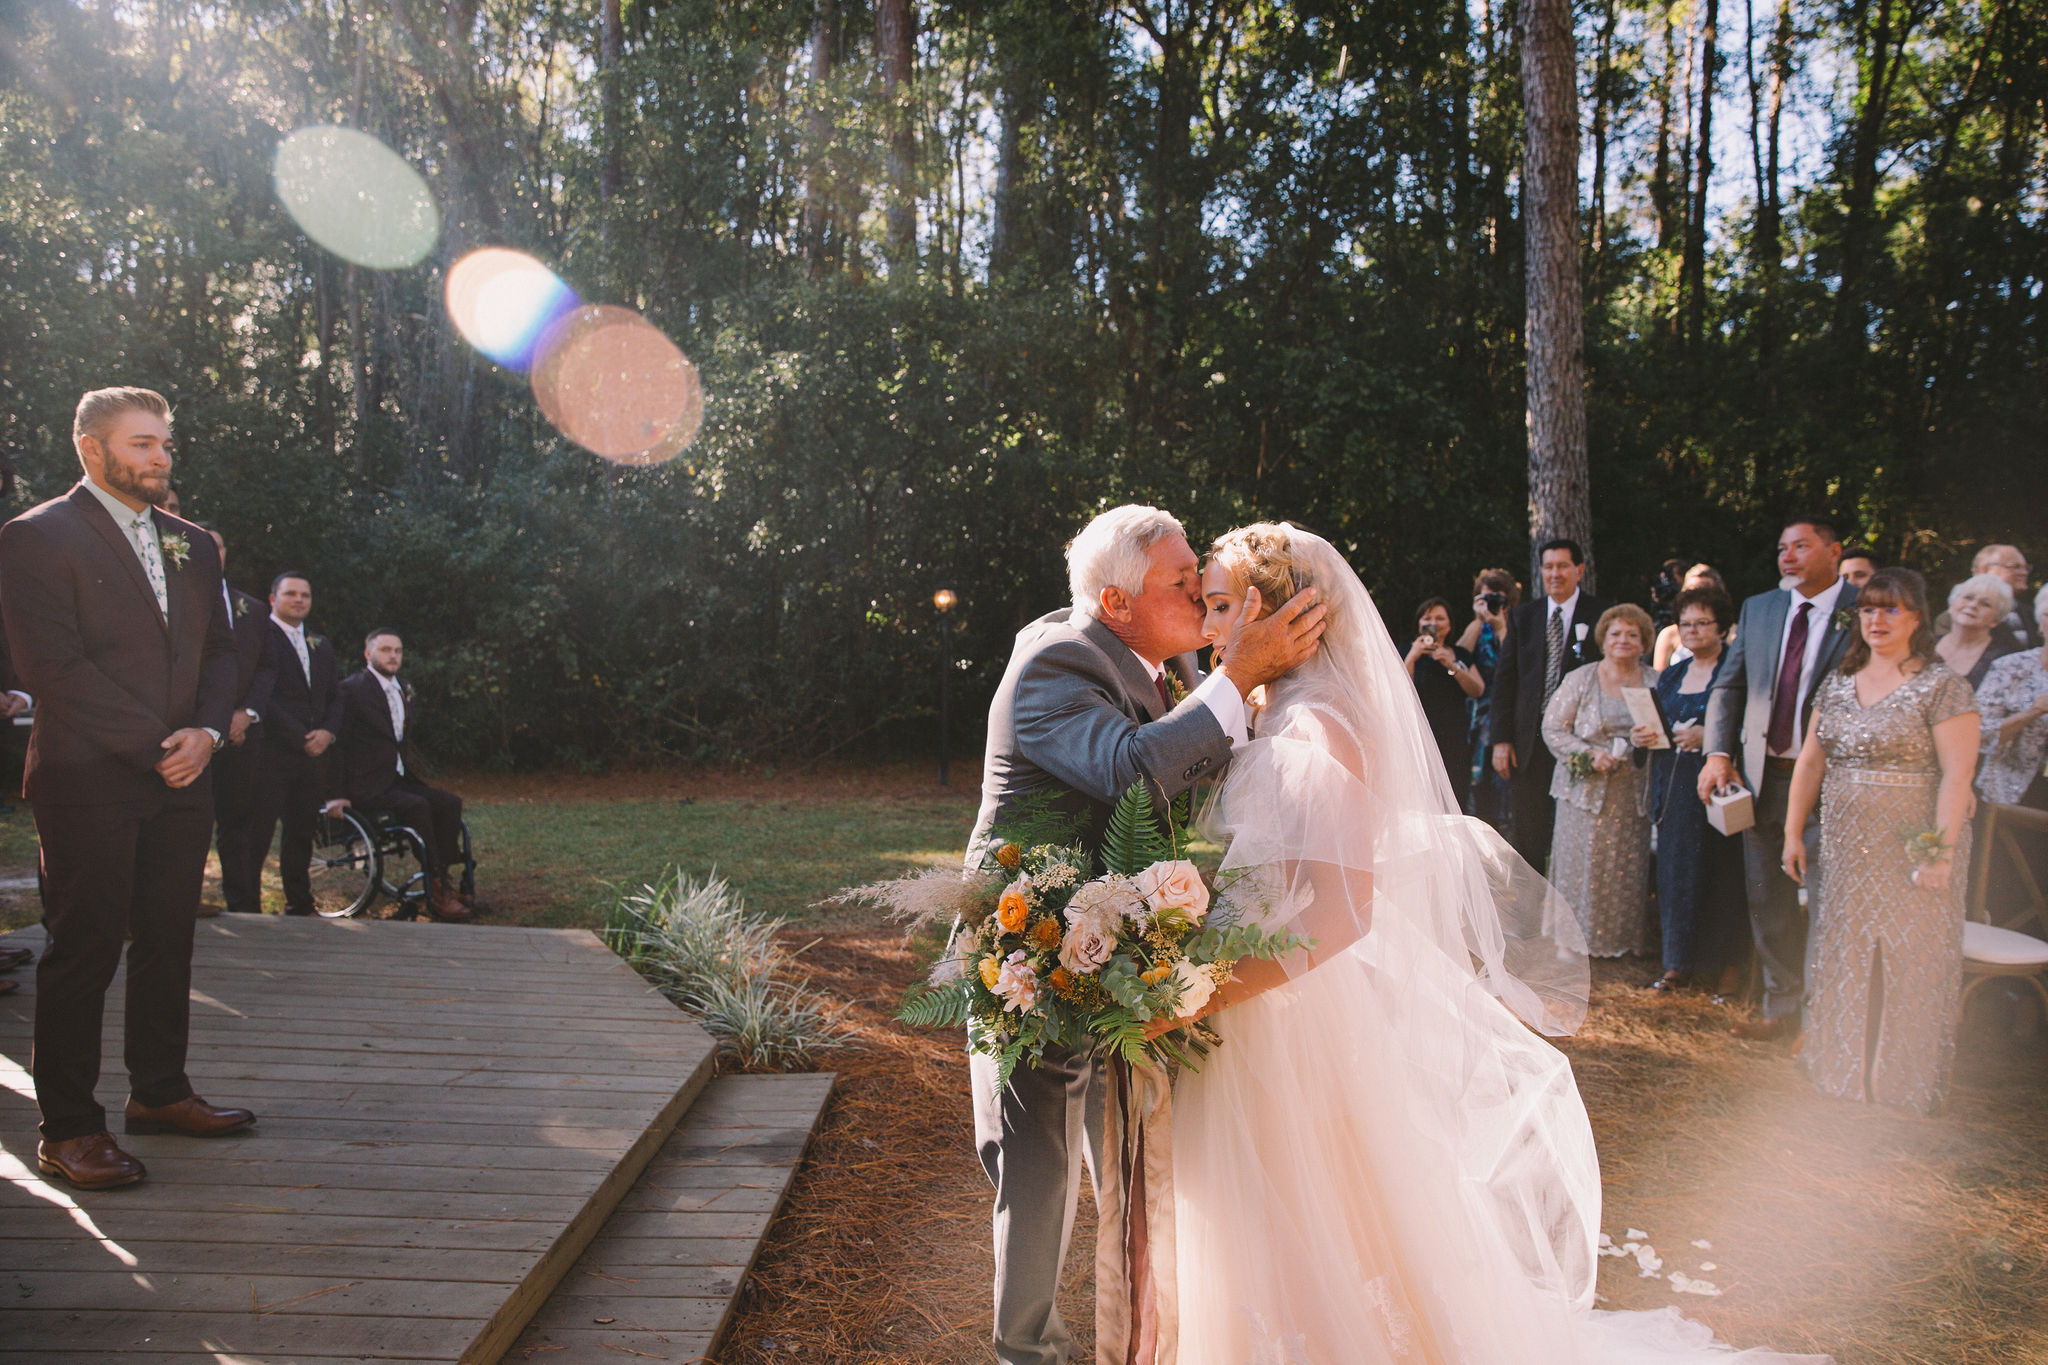 Jesseandlex_181103_AlexisNate_Wedding_Ceremony_083.jpg